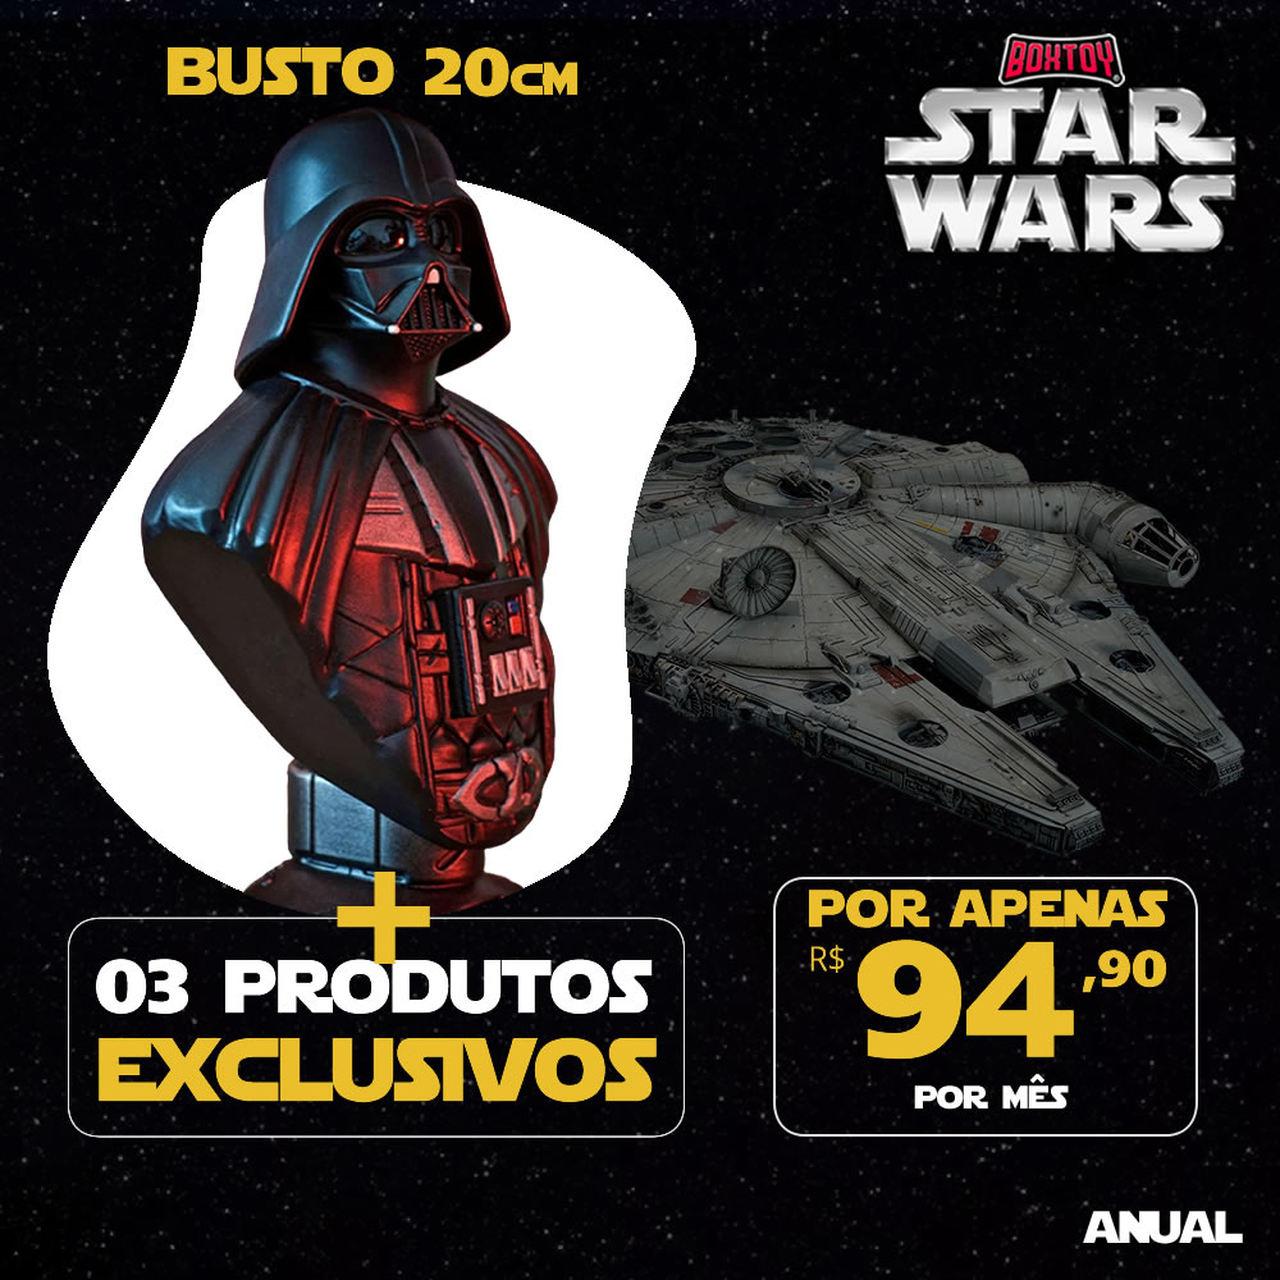 Boxtoy Edição Darth Vader - Star Wars ANUAL  - Boxtoy